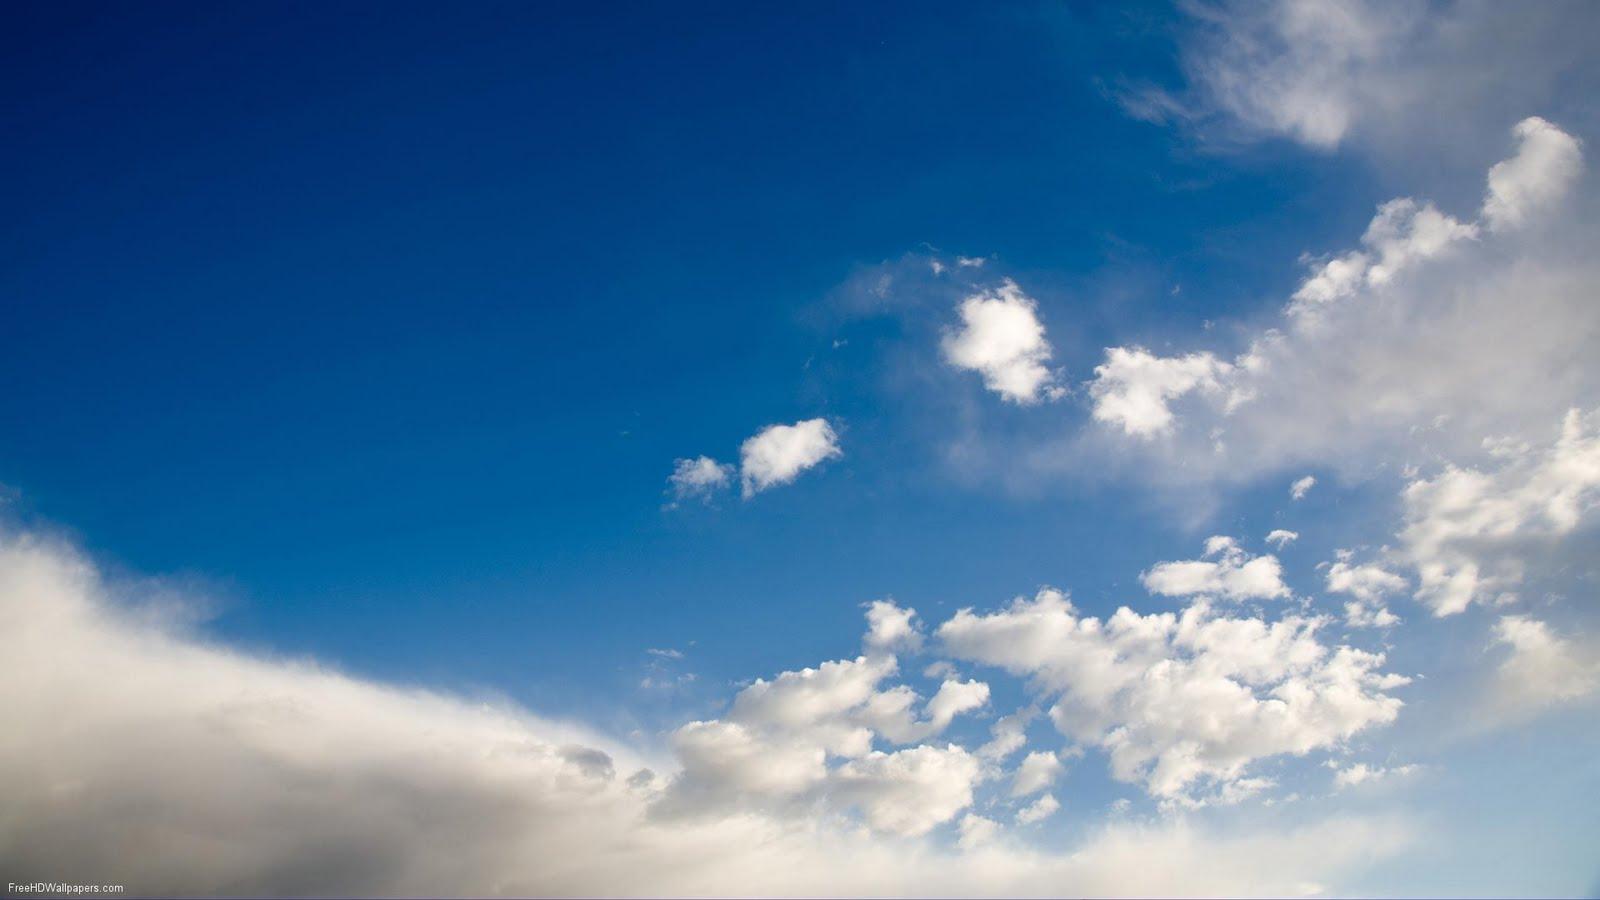 Random wallpapers: HD Clouds Wallpapers